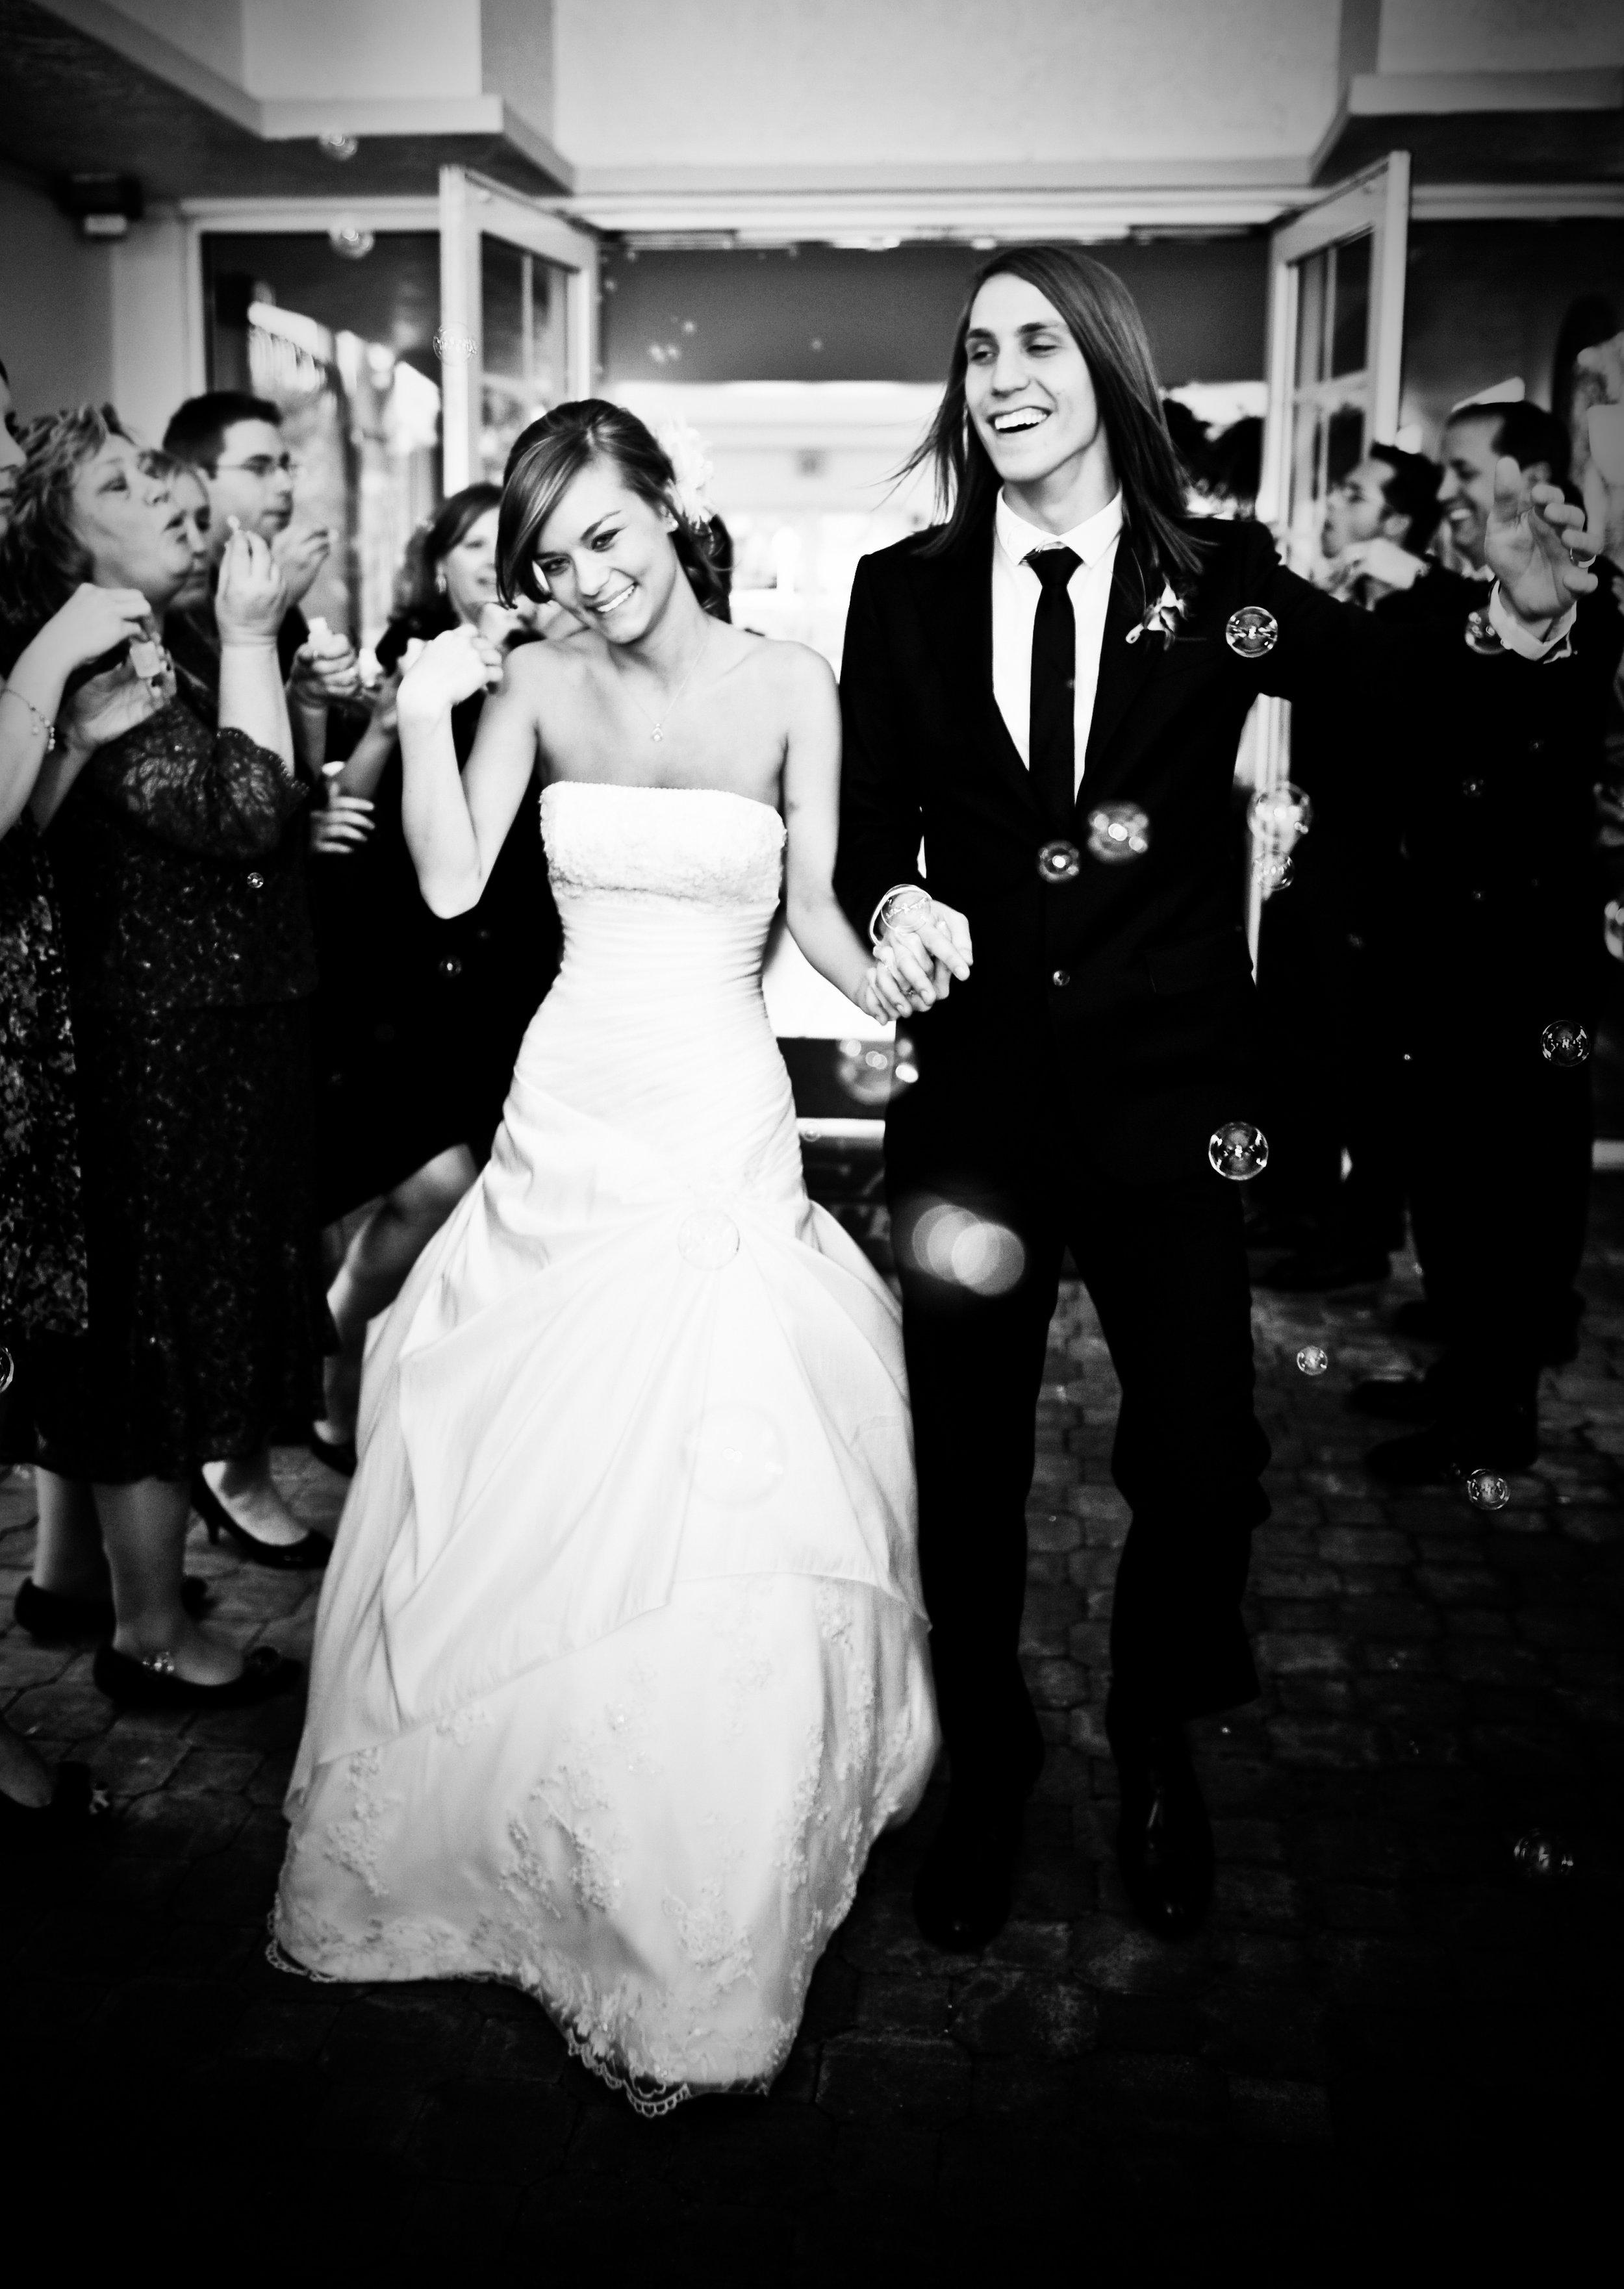 Ft. Lauderdale, Florida Couchman and Jones Wedding 2011. Strapless Wedding Dress.